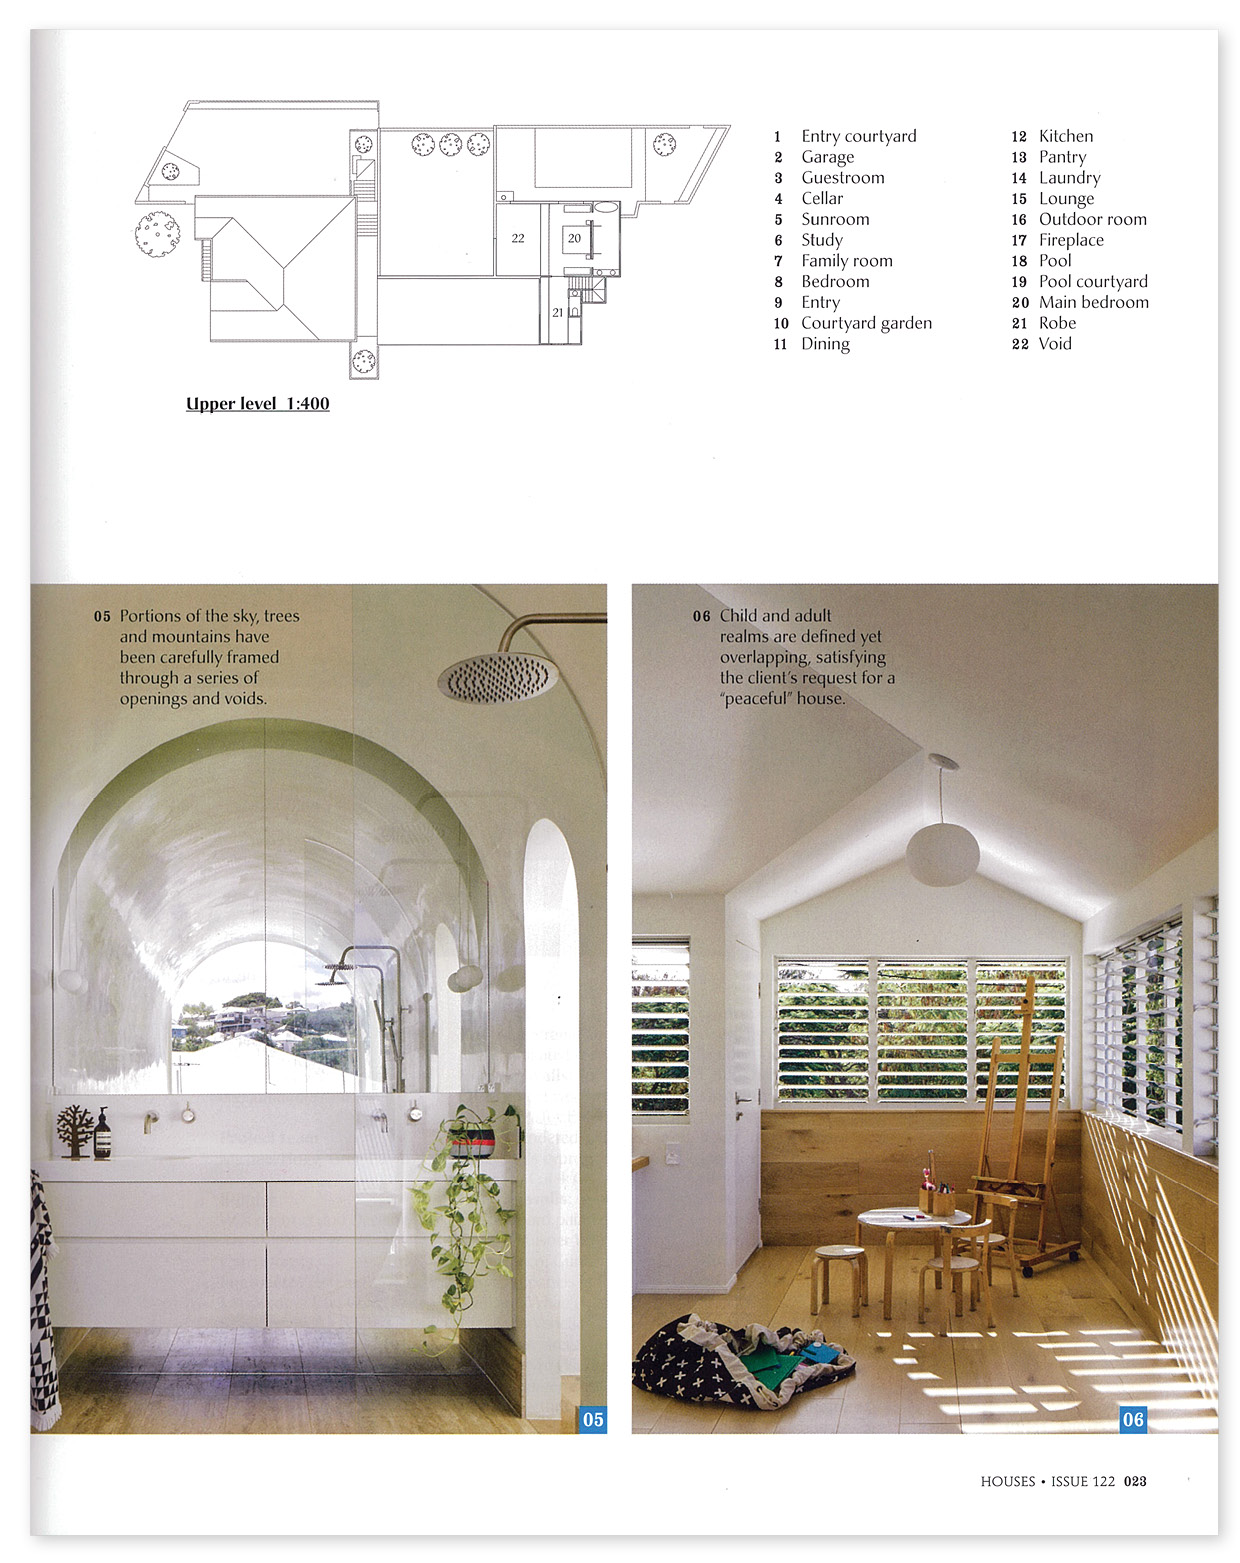 houses_web_5.jpg